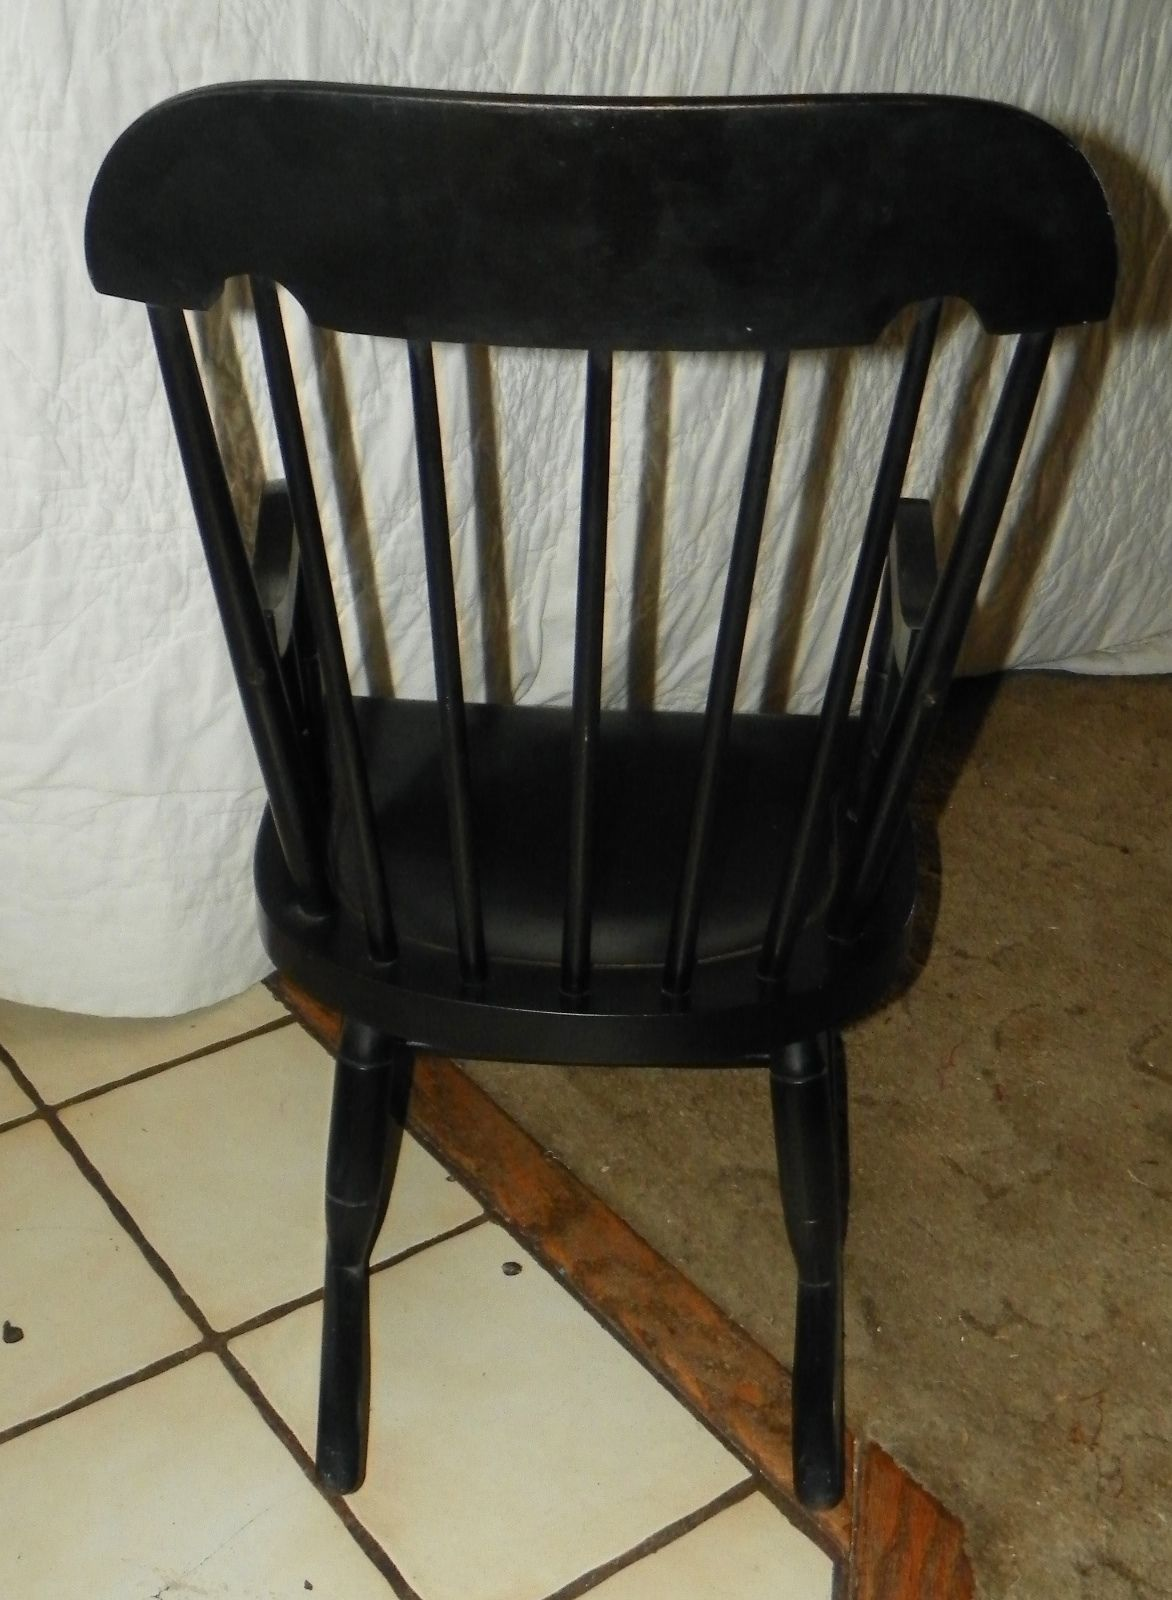 Nichols & Stone Maple Handpainted Childs Rocker / Rocking Chair (R72...